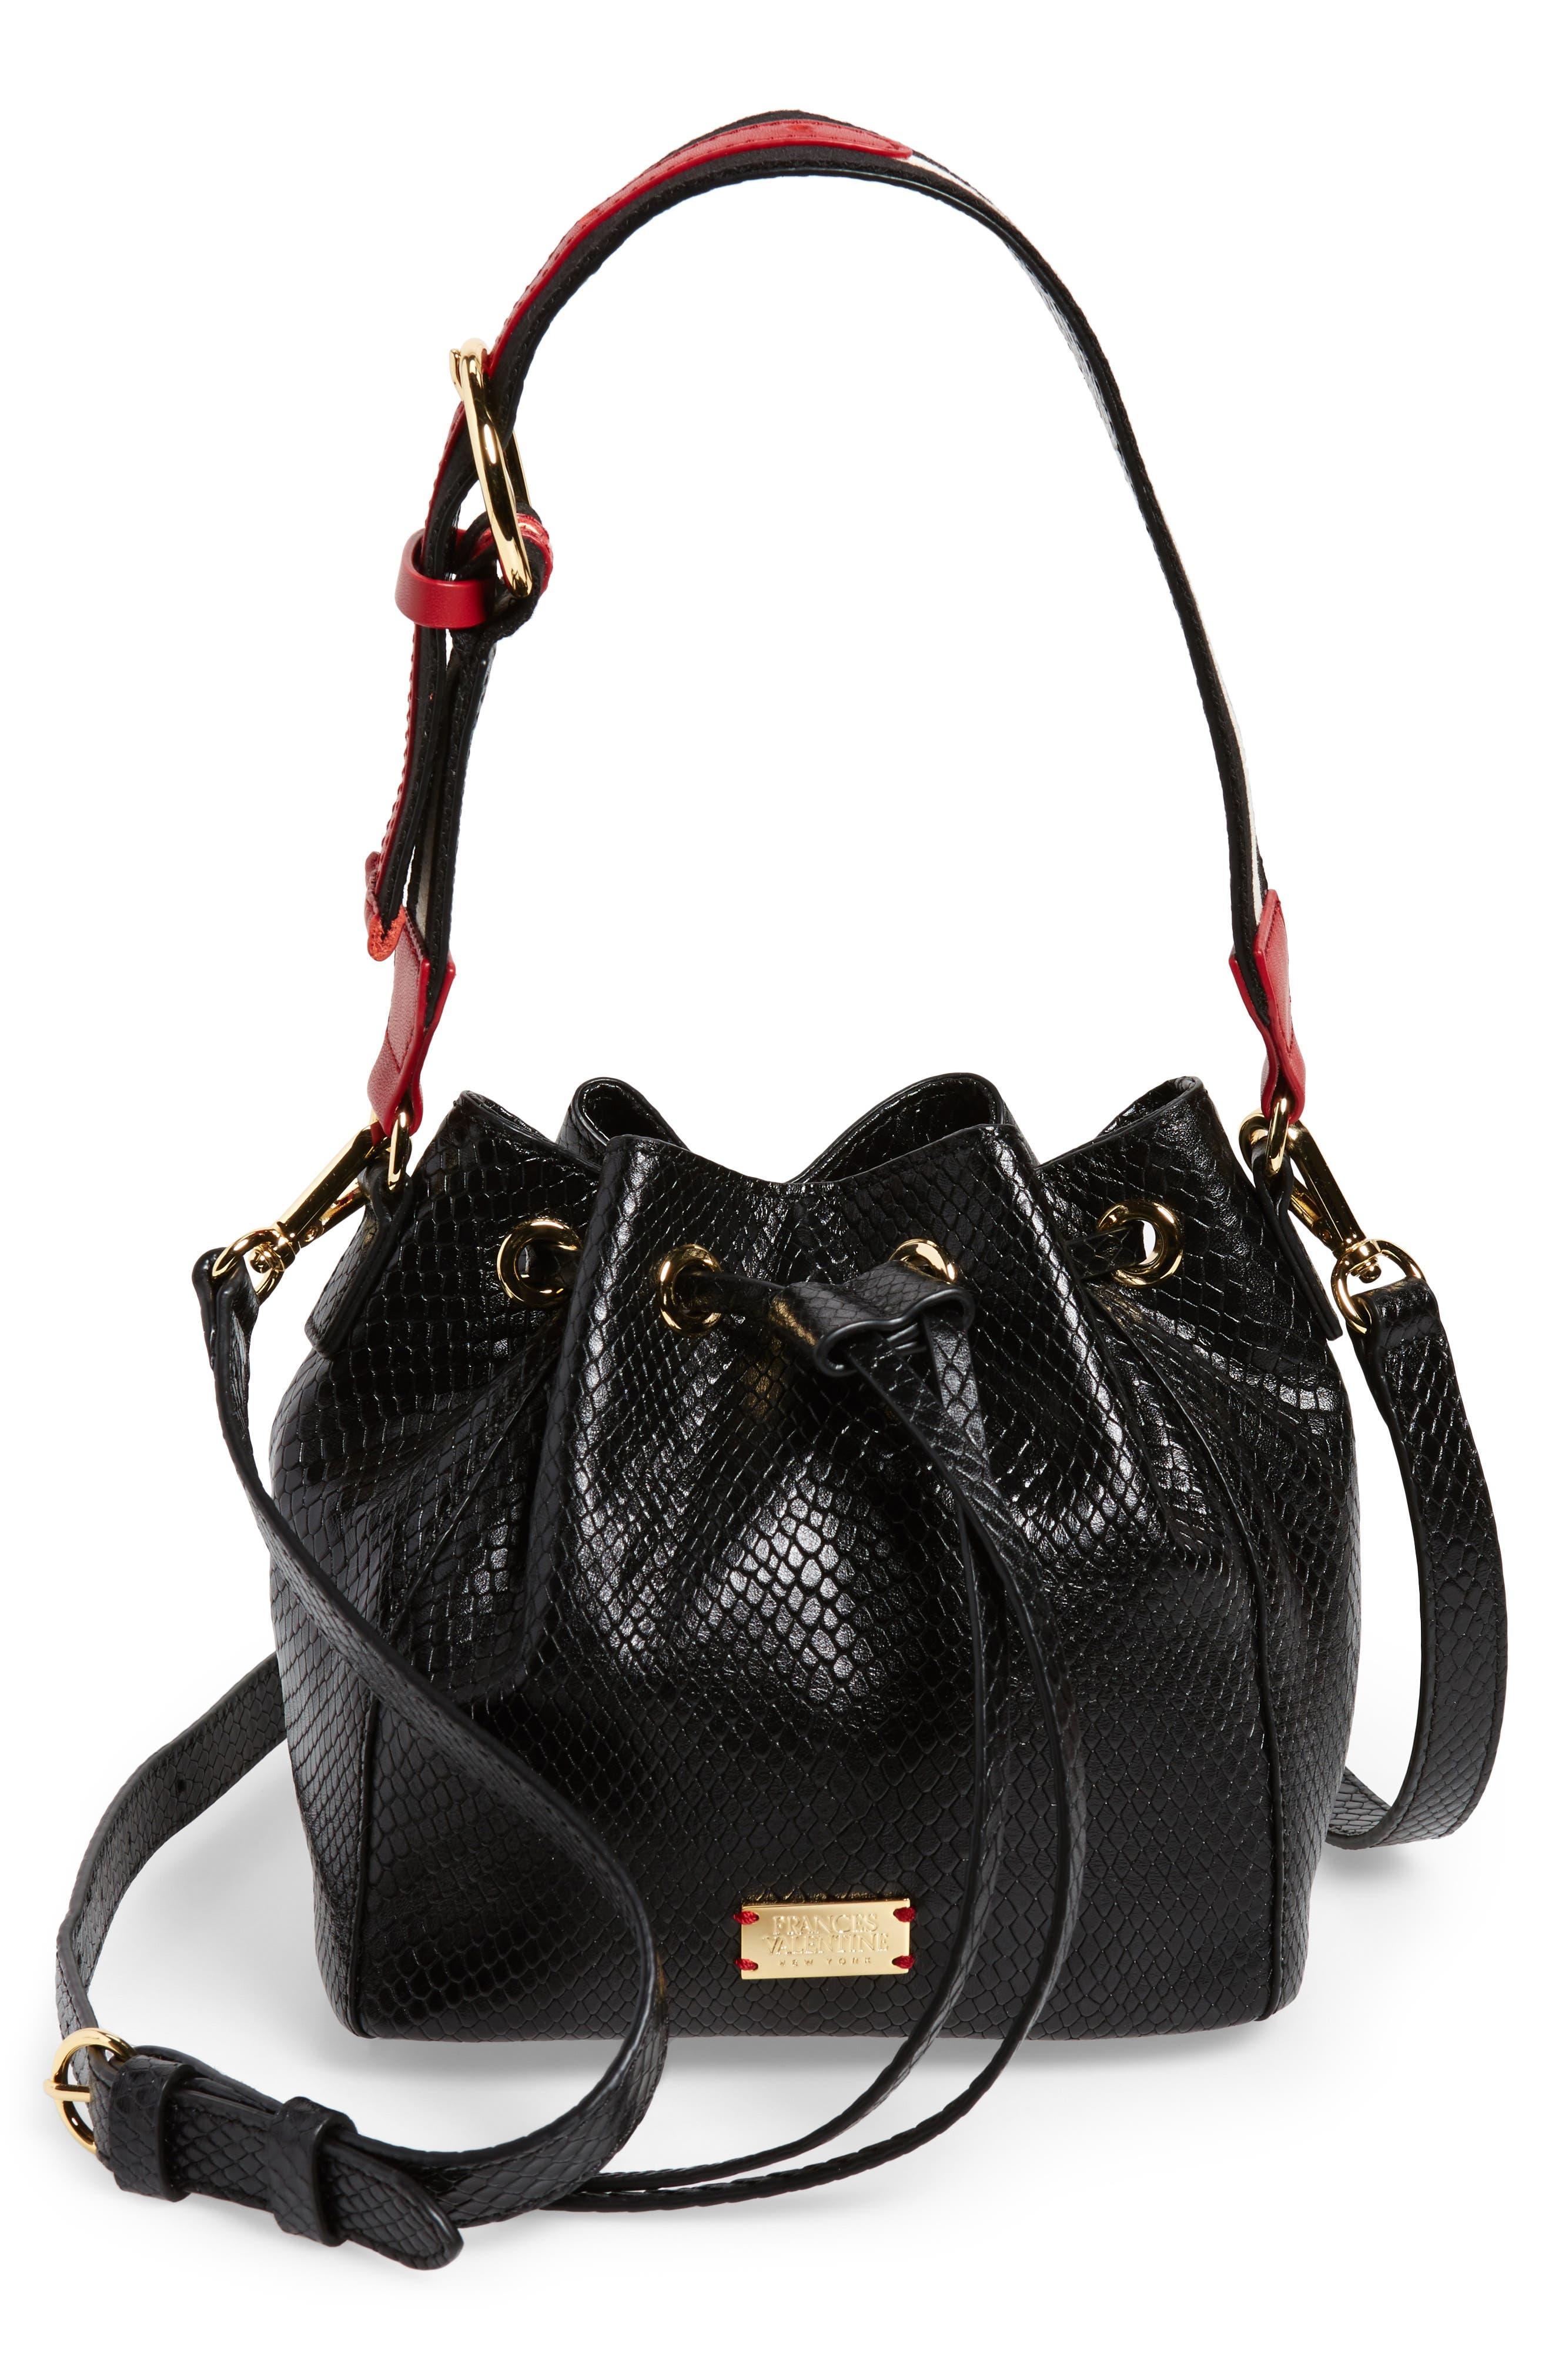 Frances Valentine Small Snakeskin Embossed Leather Bucket Bag